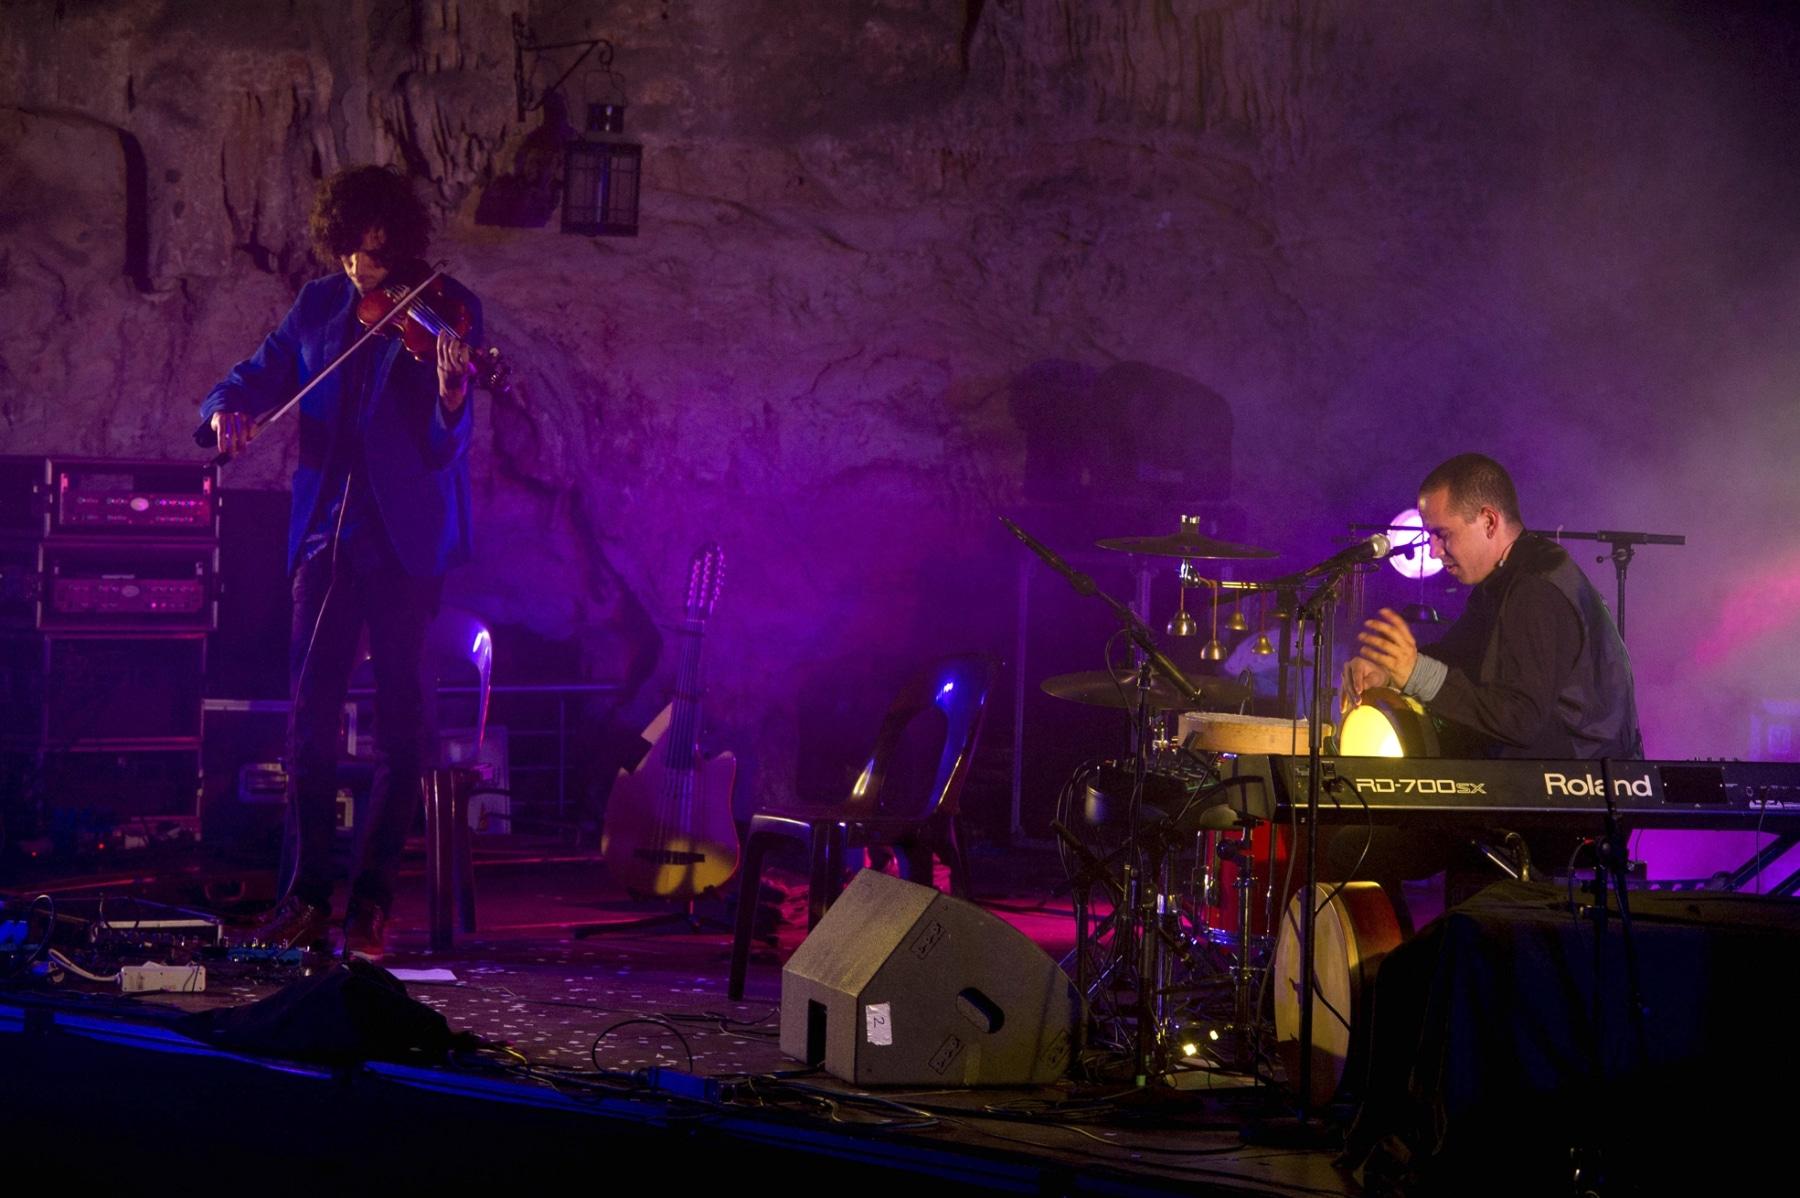 19-mayo-gibraltar-world-music-festival26_14277760389_o